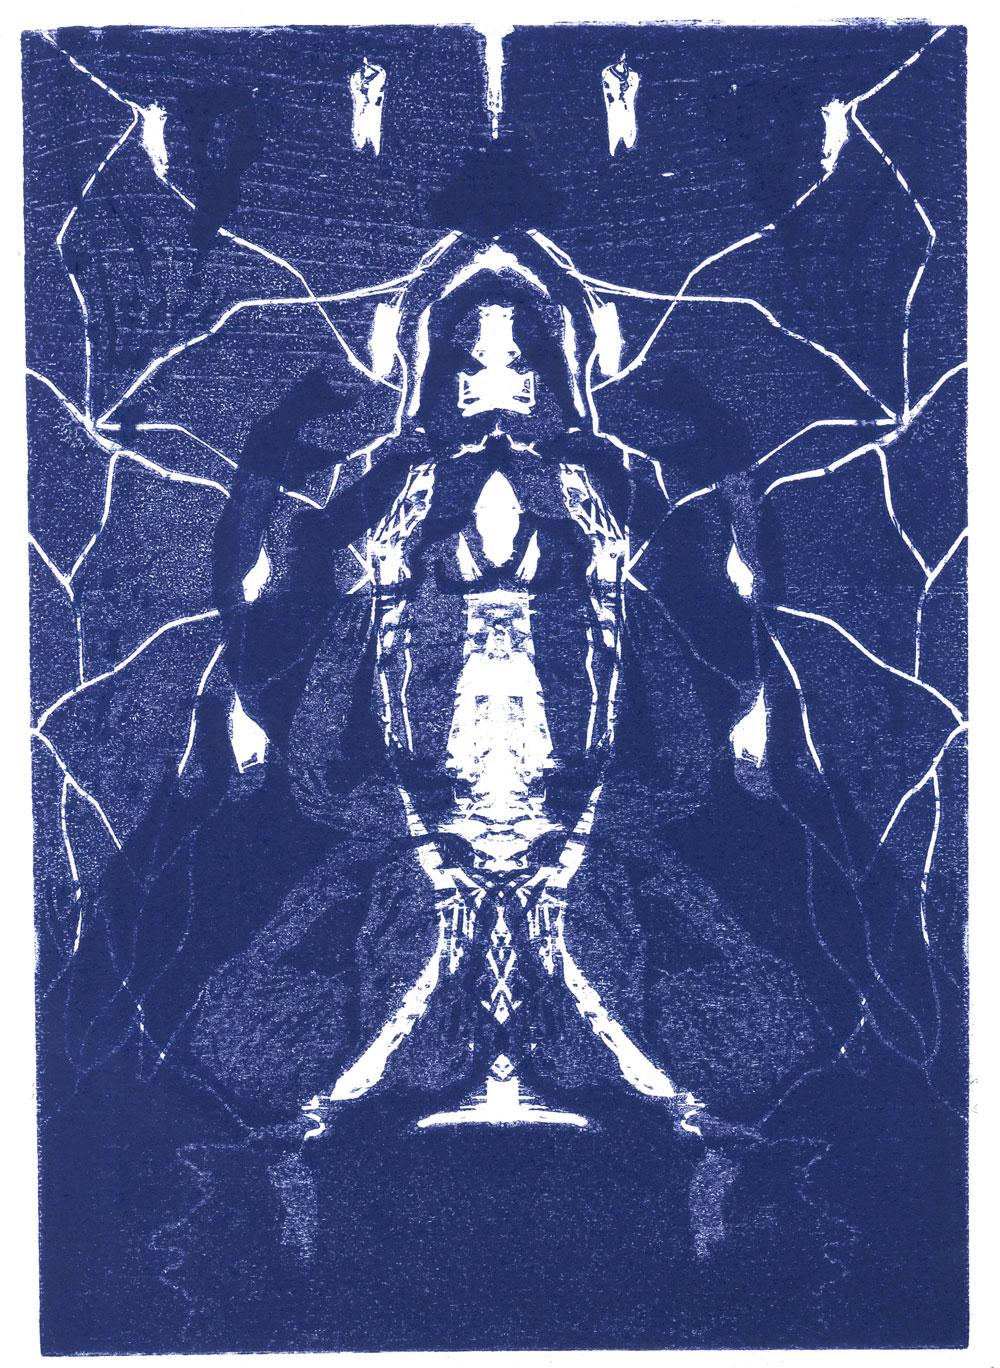 engraving3-charliecth